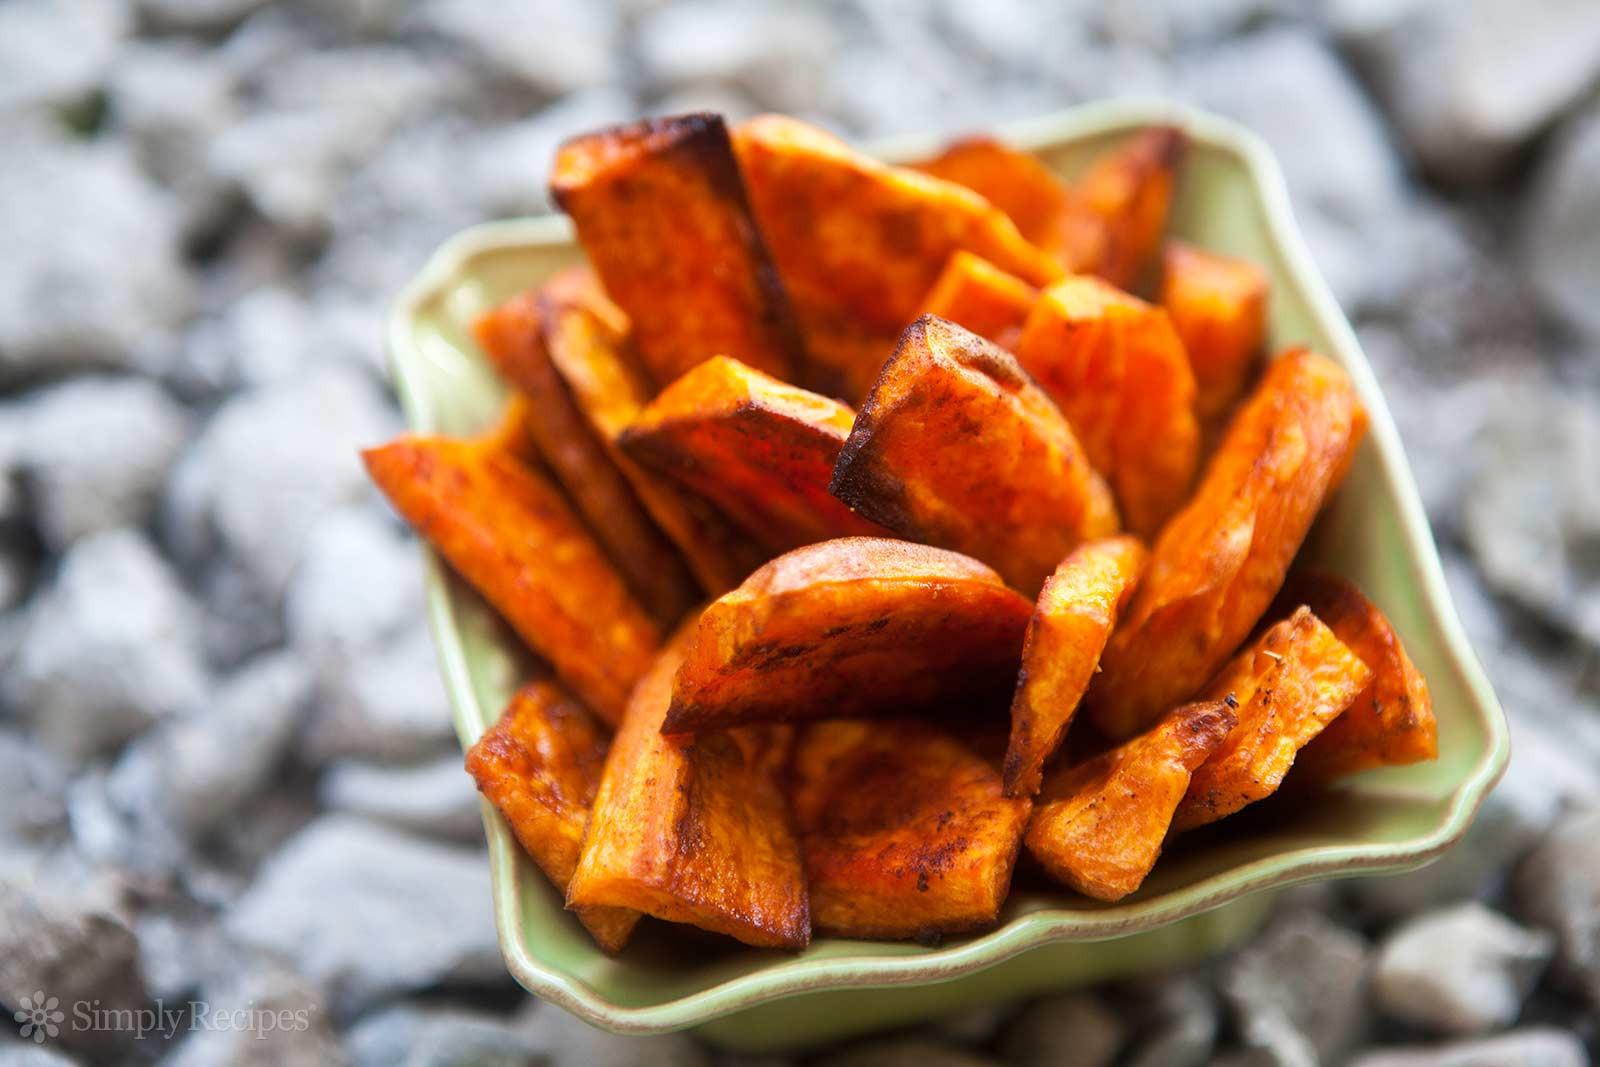 Baked Sweet Potato  Oven Baked Sweet Potato Fries Recipe